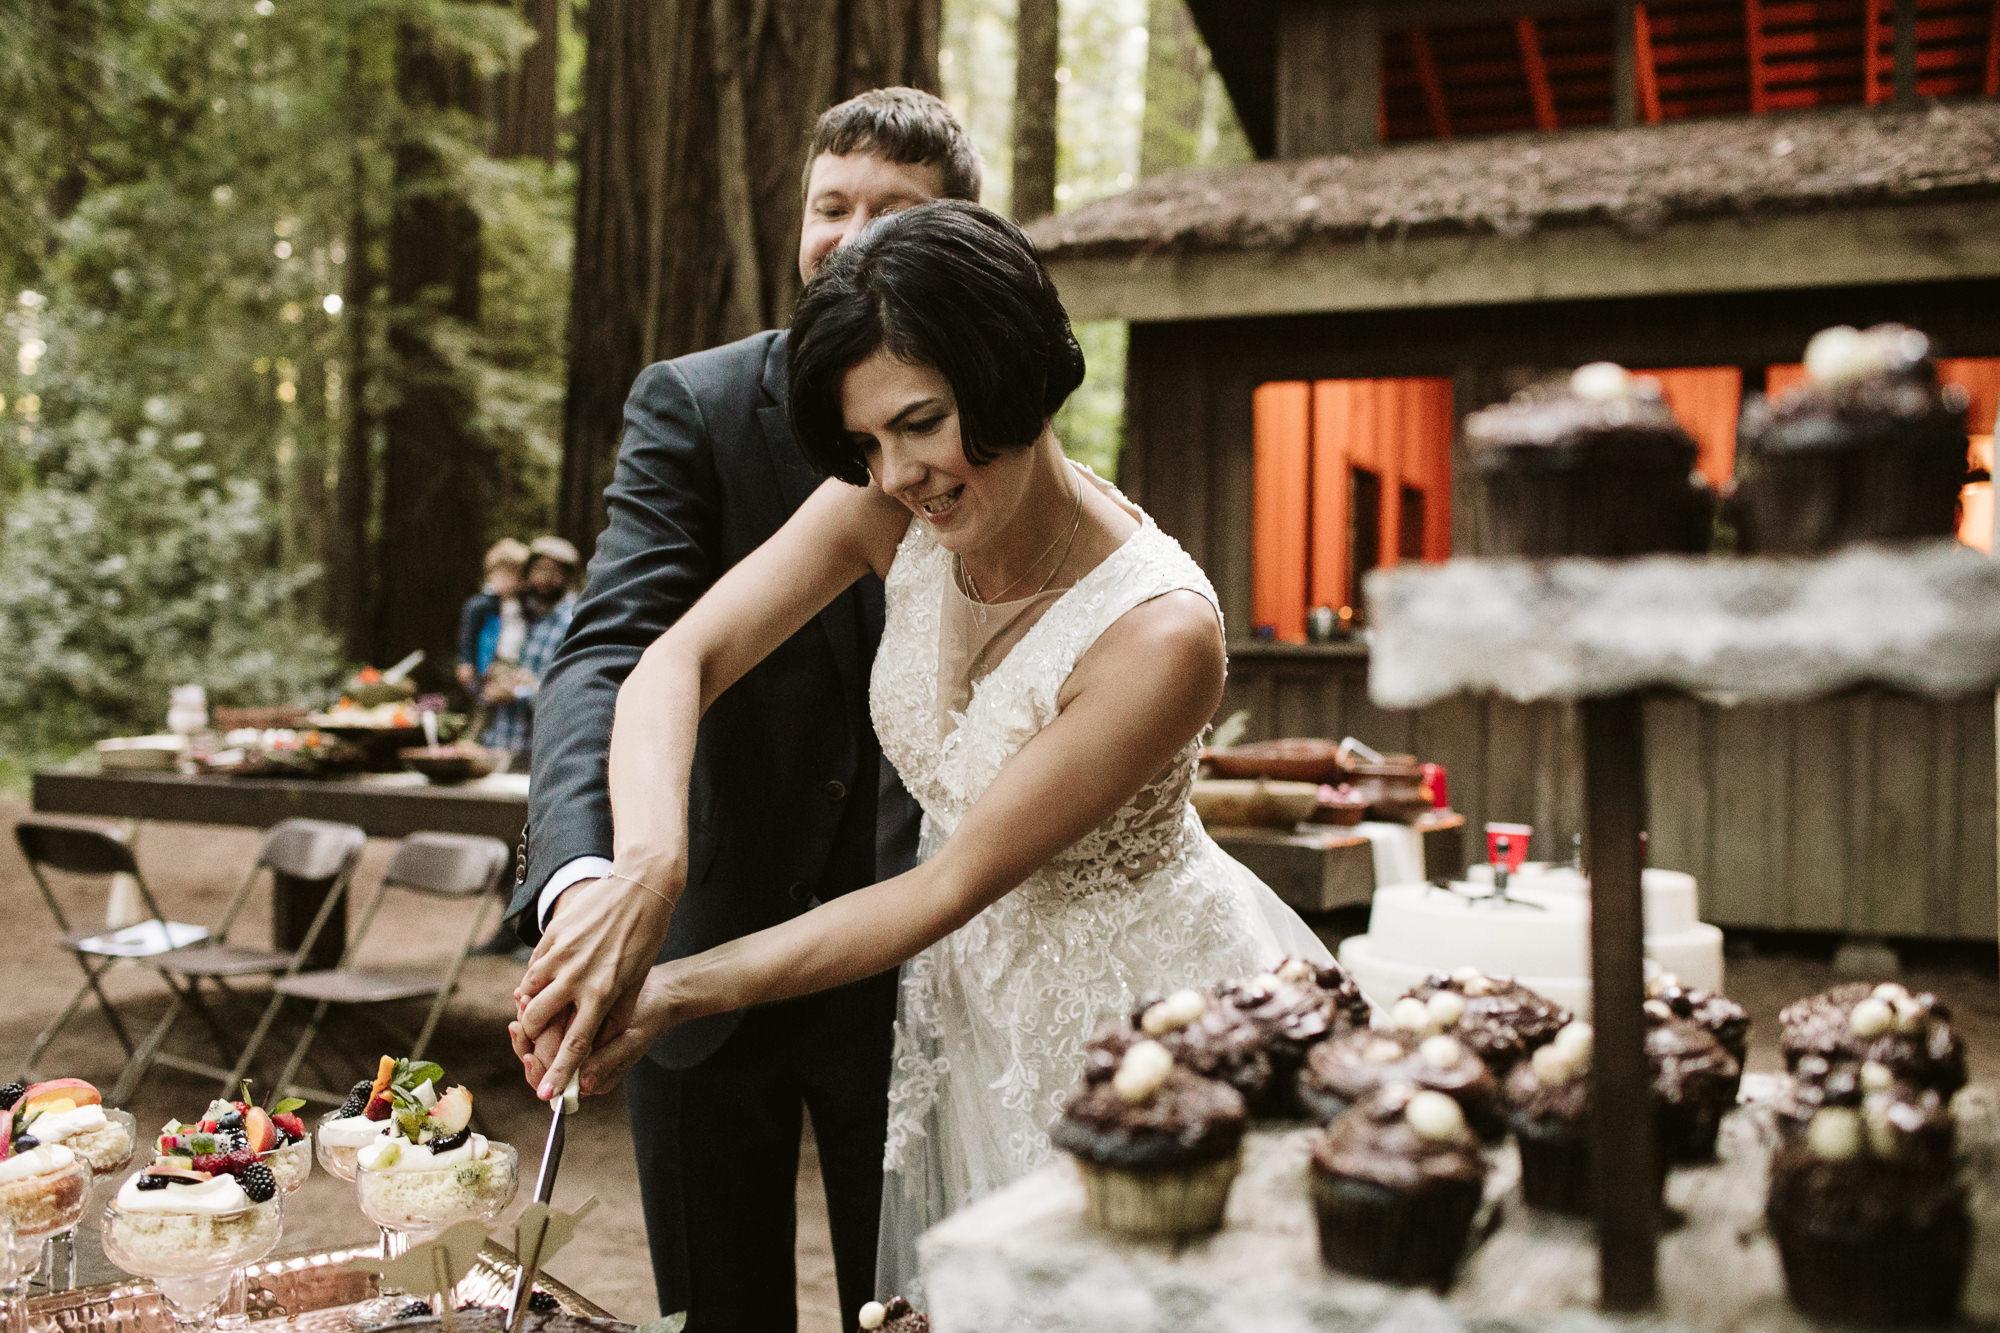 California-wedding-photographer-alfonso-flores-pamplin-groove-334.jpg